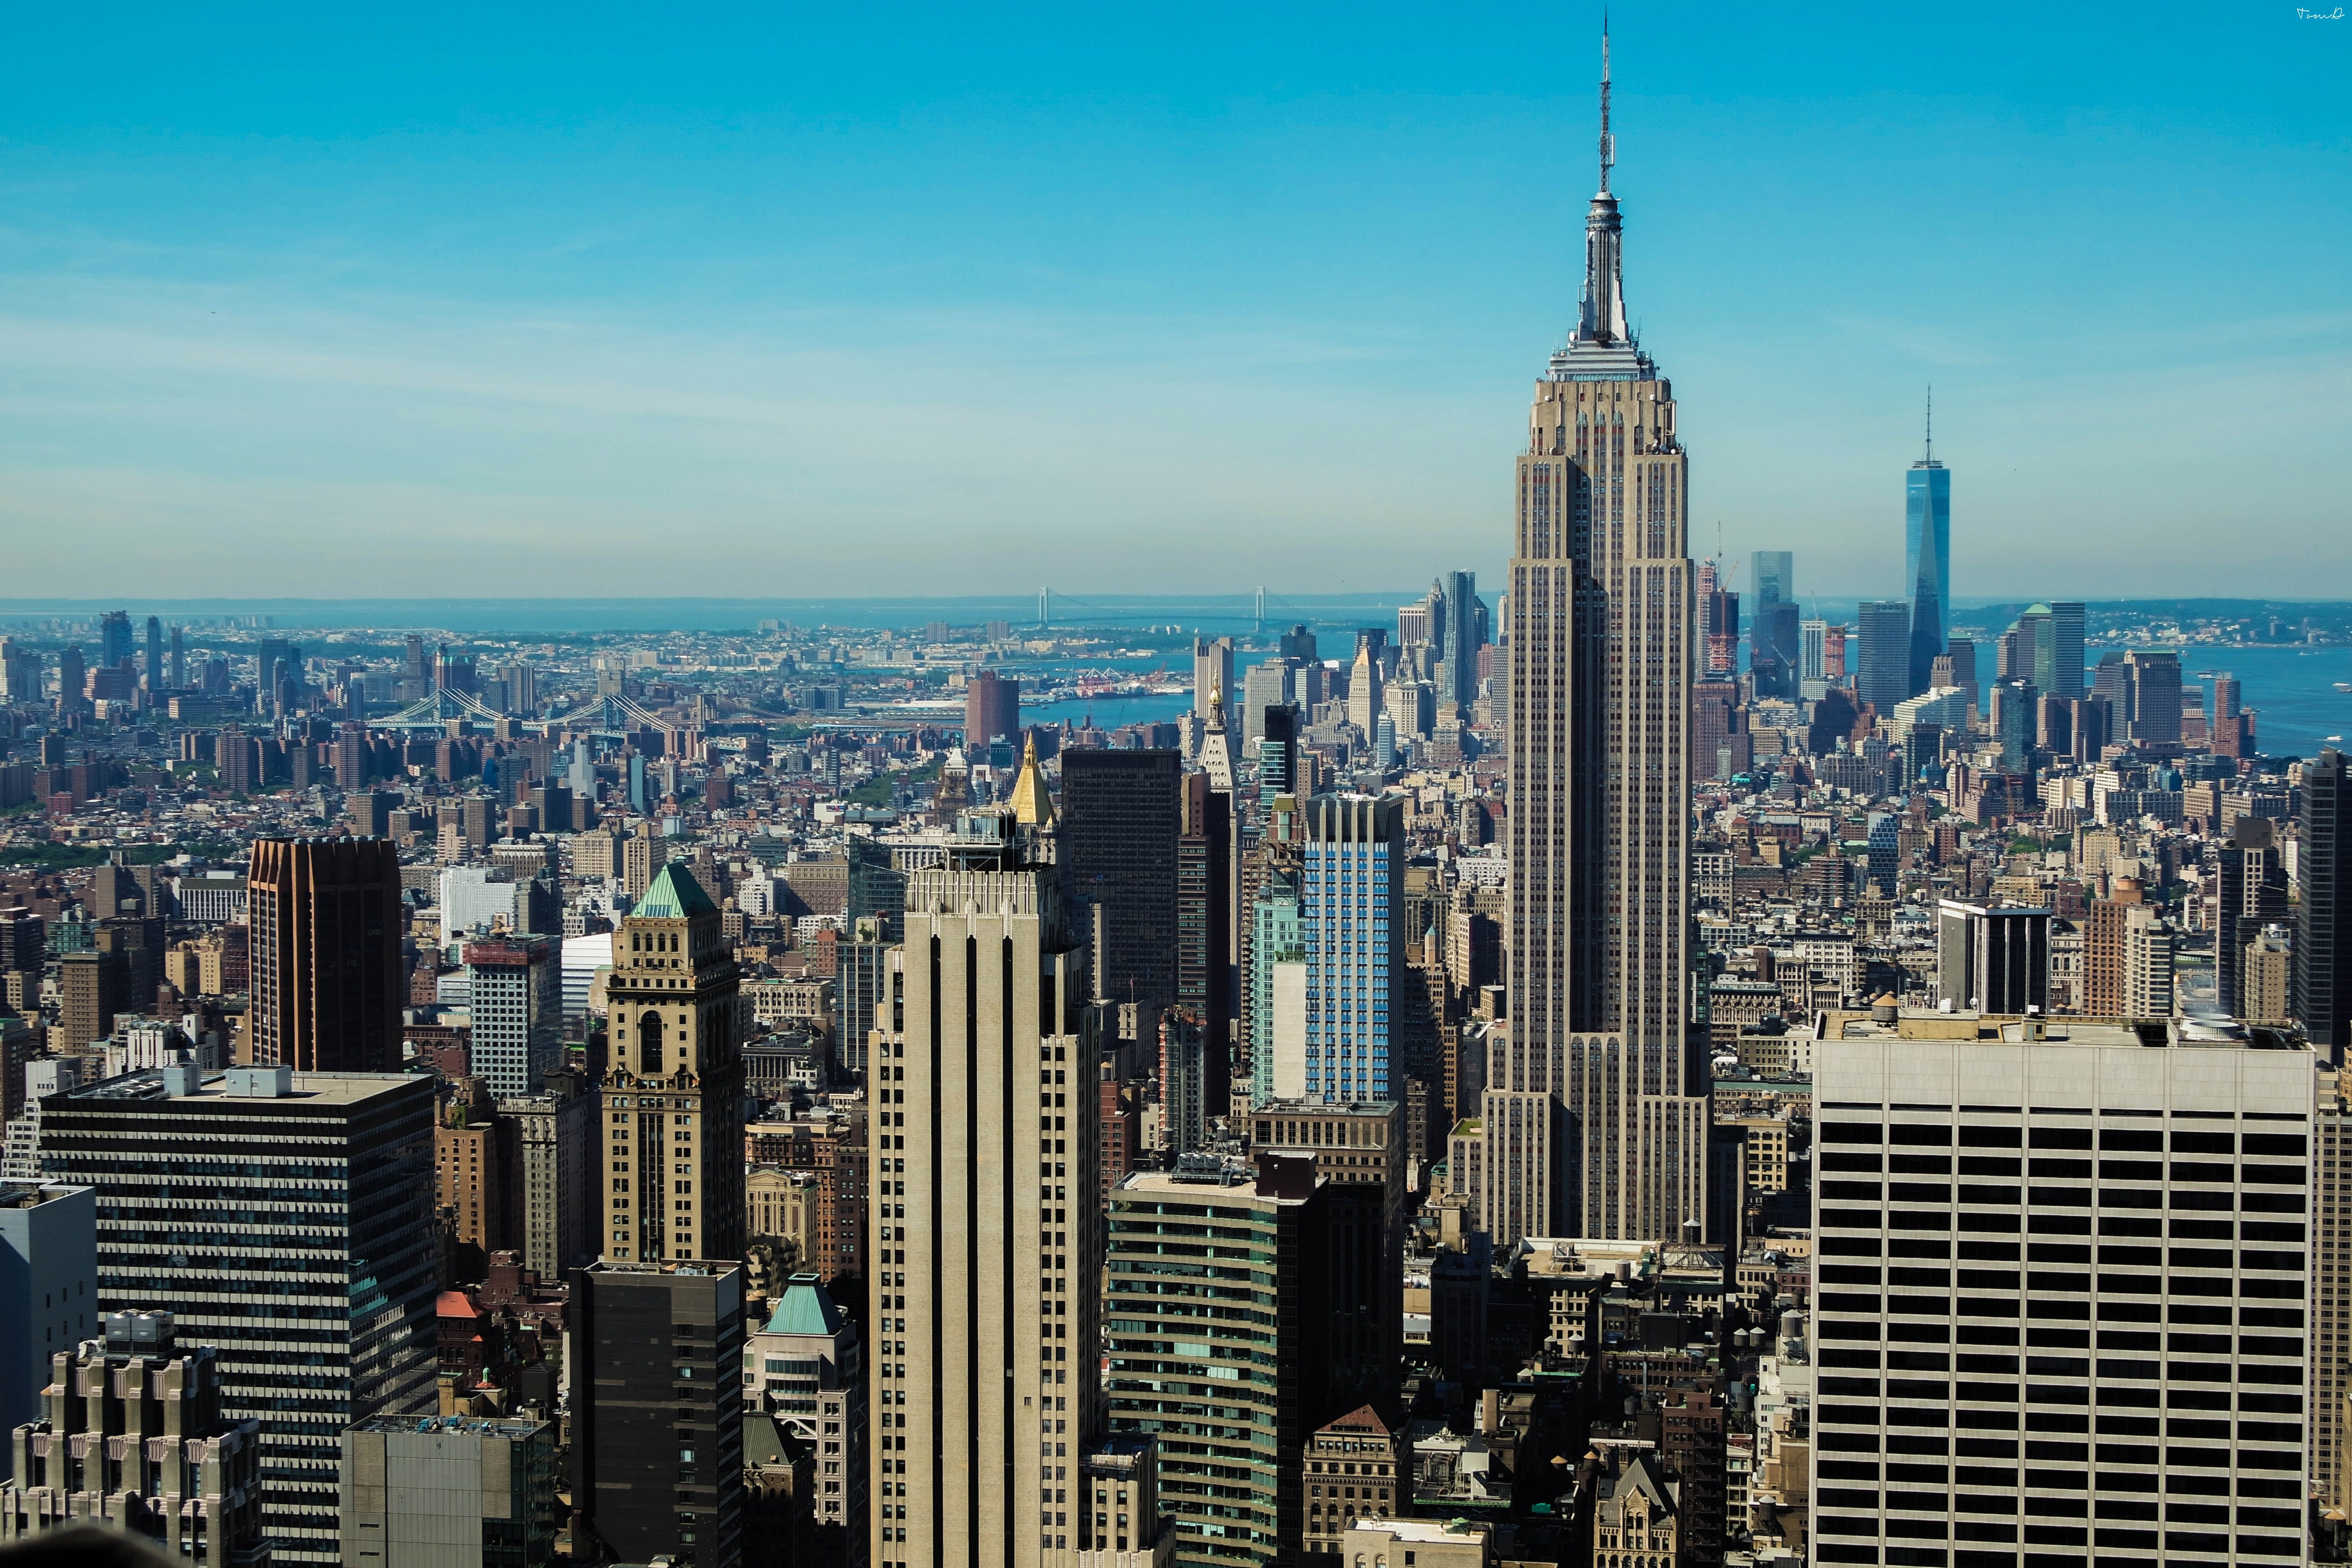 New York City Property Image Pexels